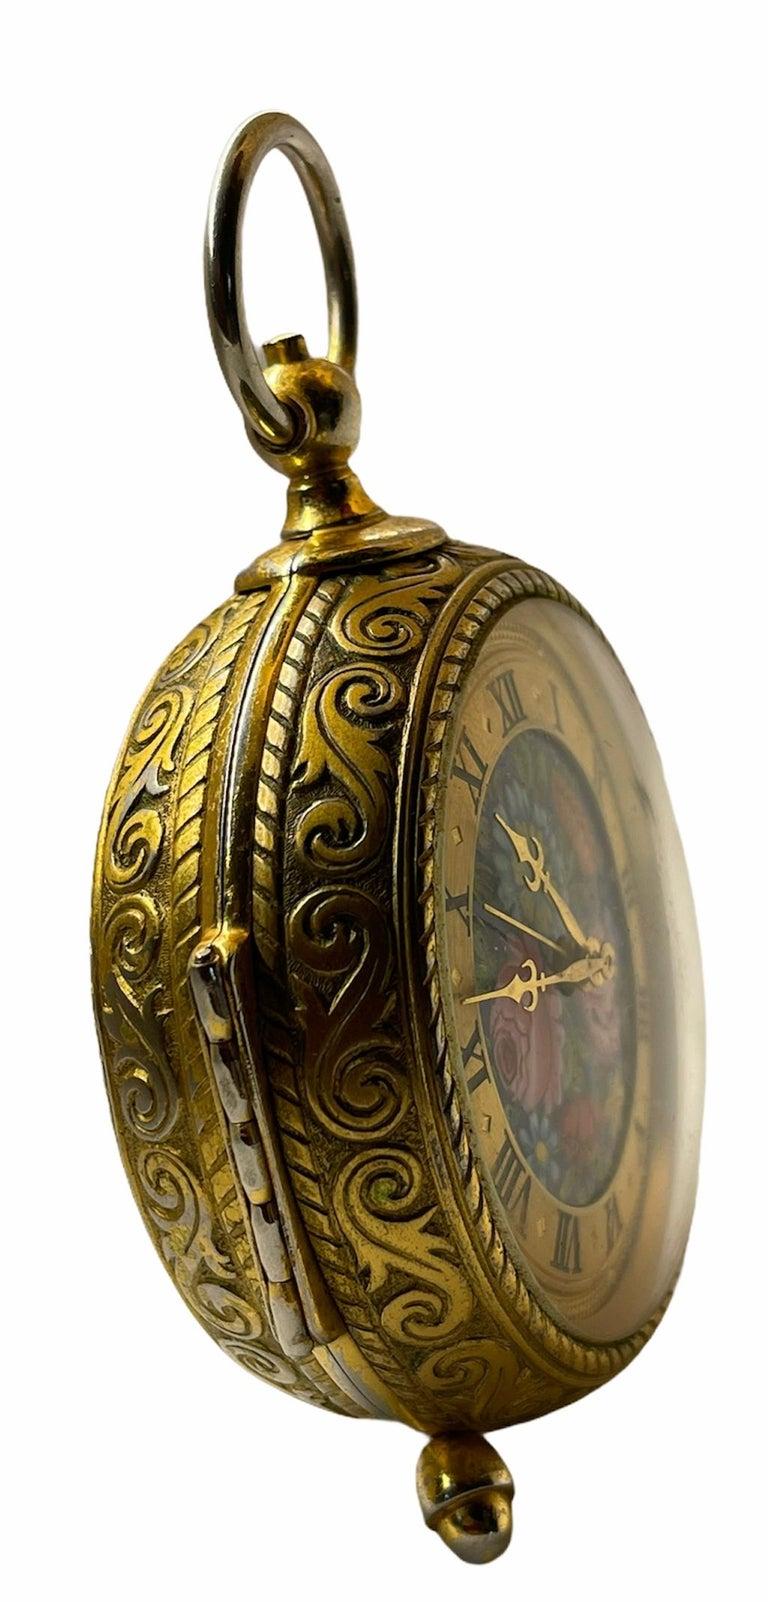 20th Century Rare IMHOF Bronze Enamel Alarm Travel Clock For Sale